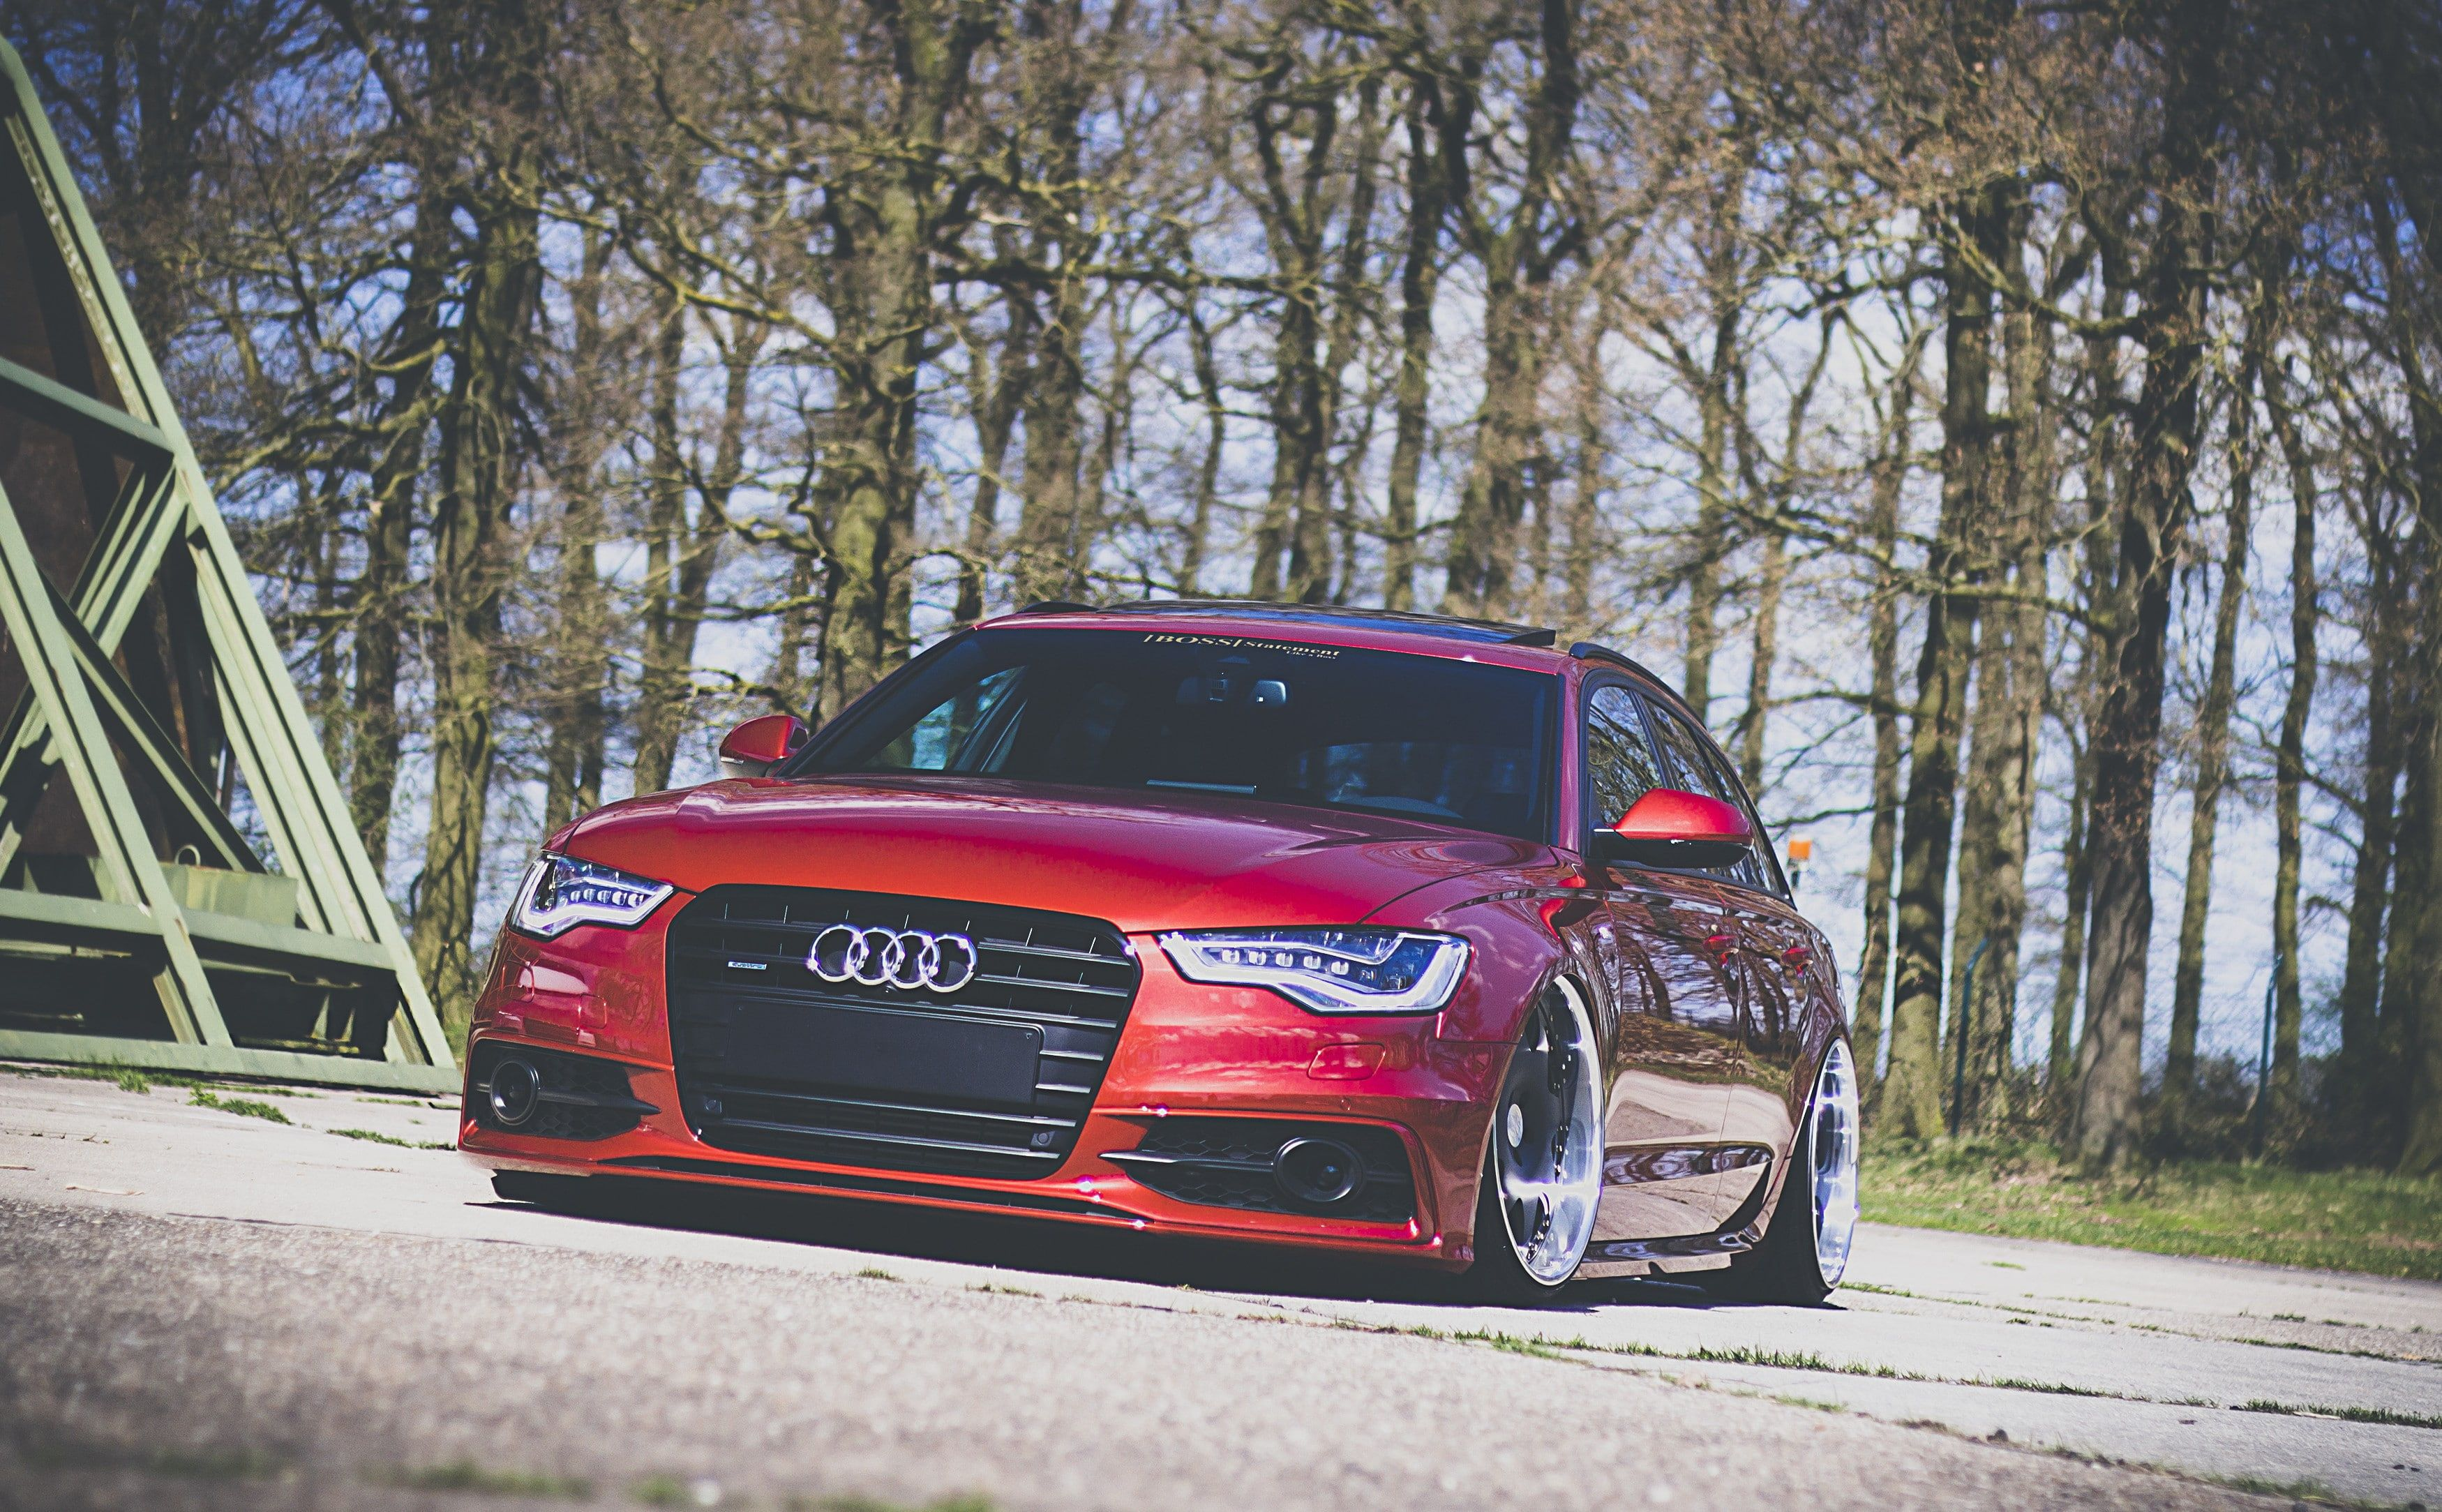 Audi A6 Avant Audi A6 Avant Wagon Red Stance Front S Best 2k Wallpaper Hdwallpaper Desktop Audi A6 Audi Audi A6 Avant